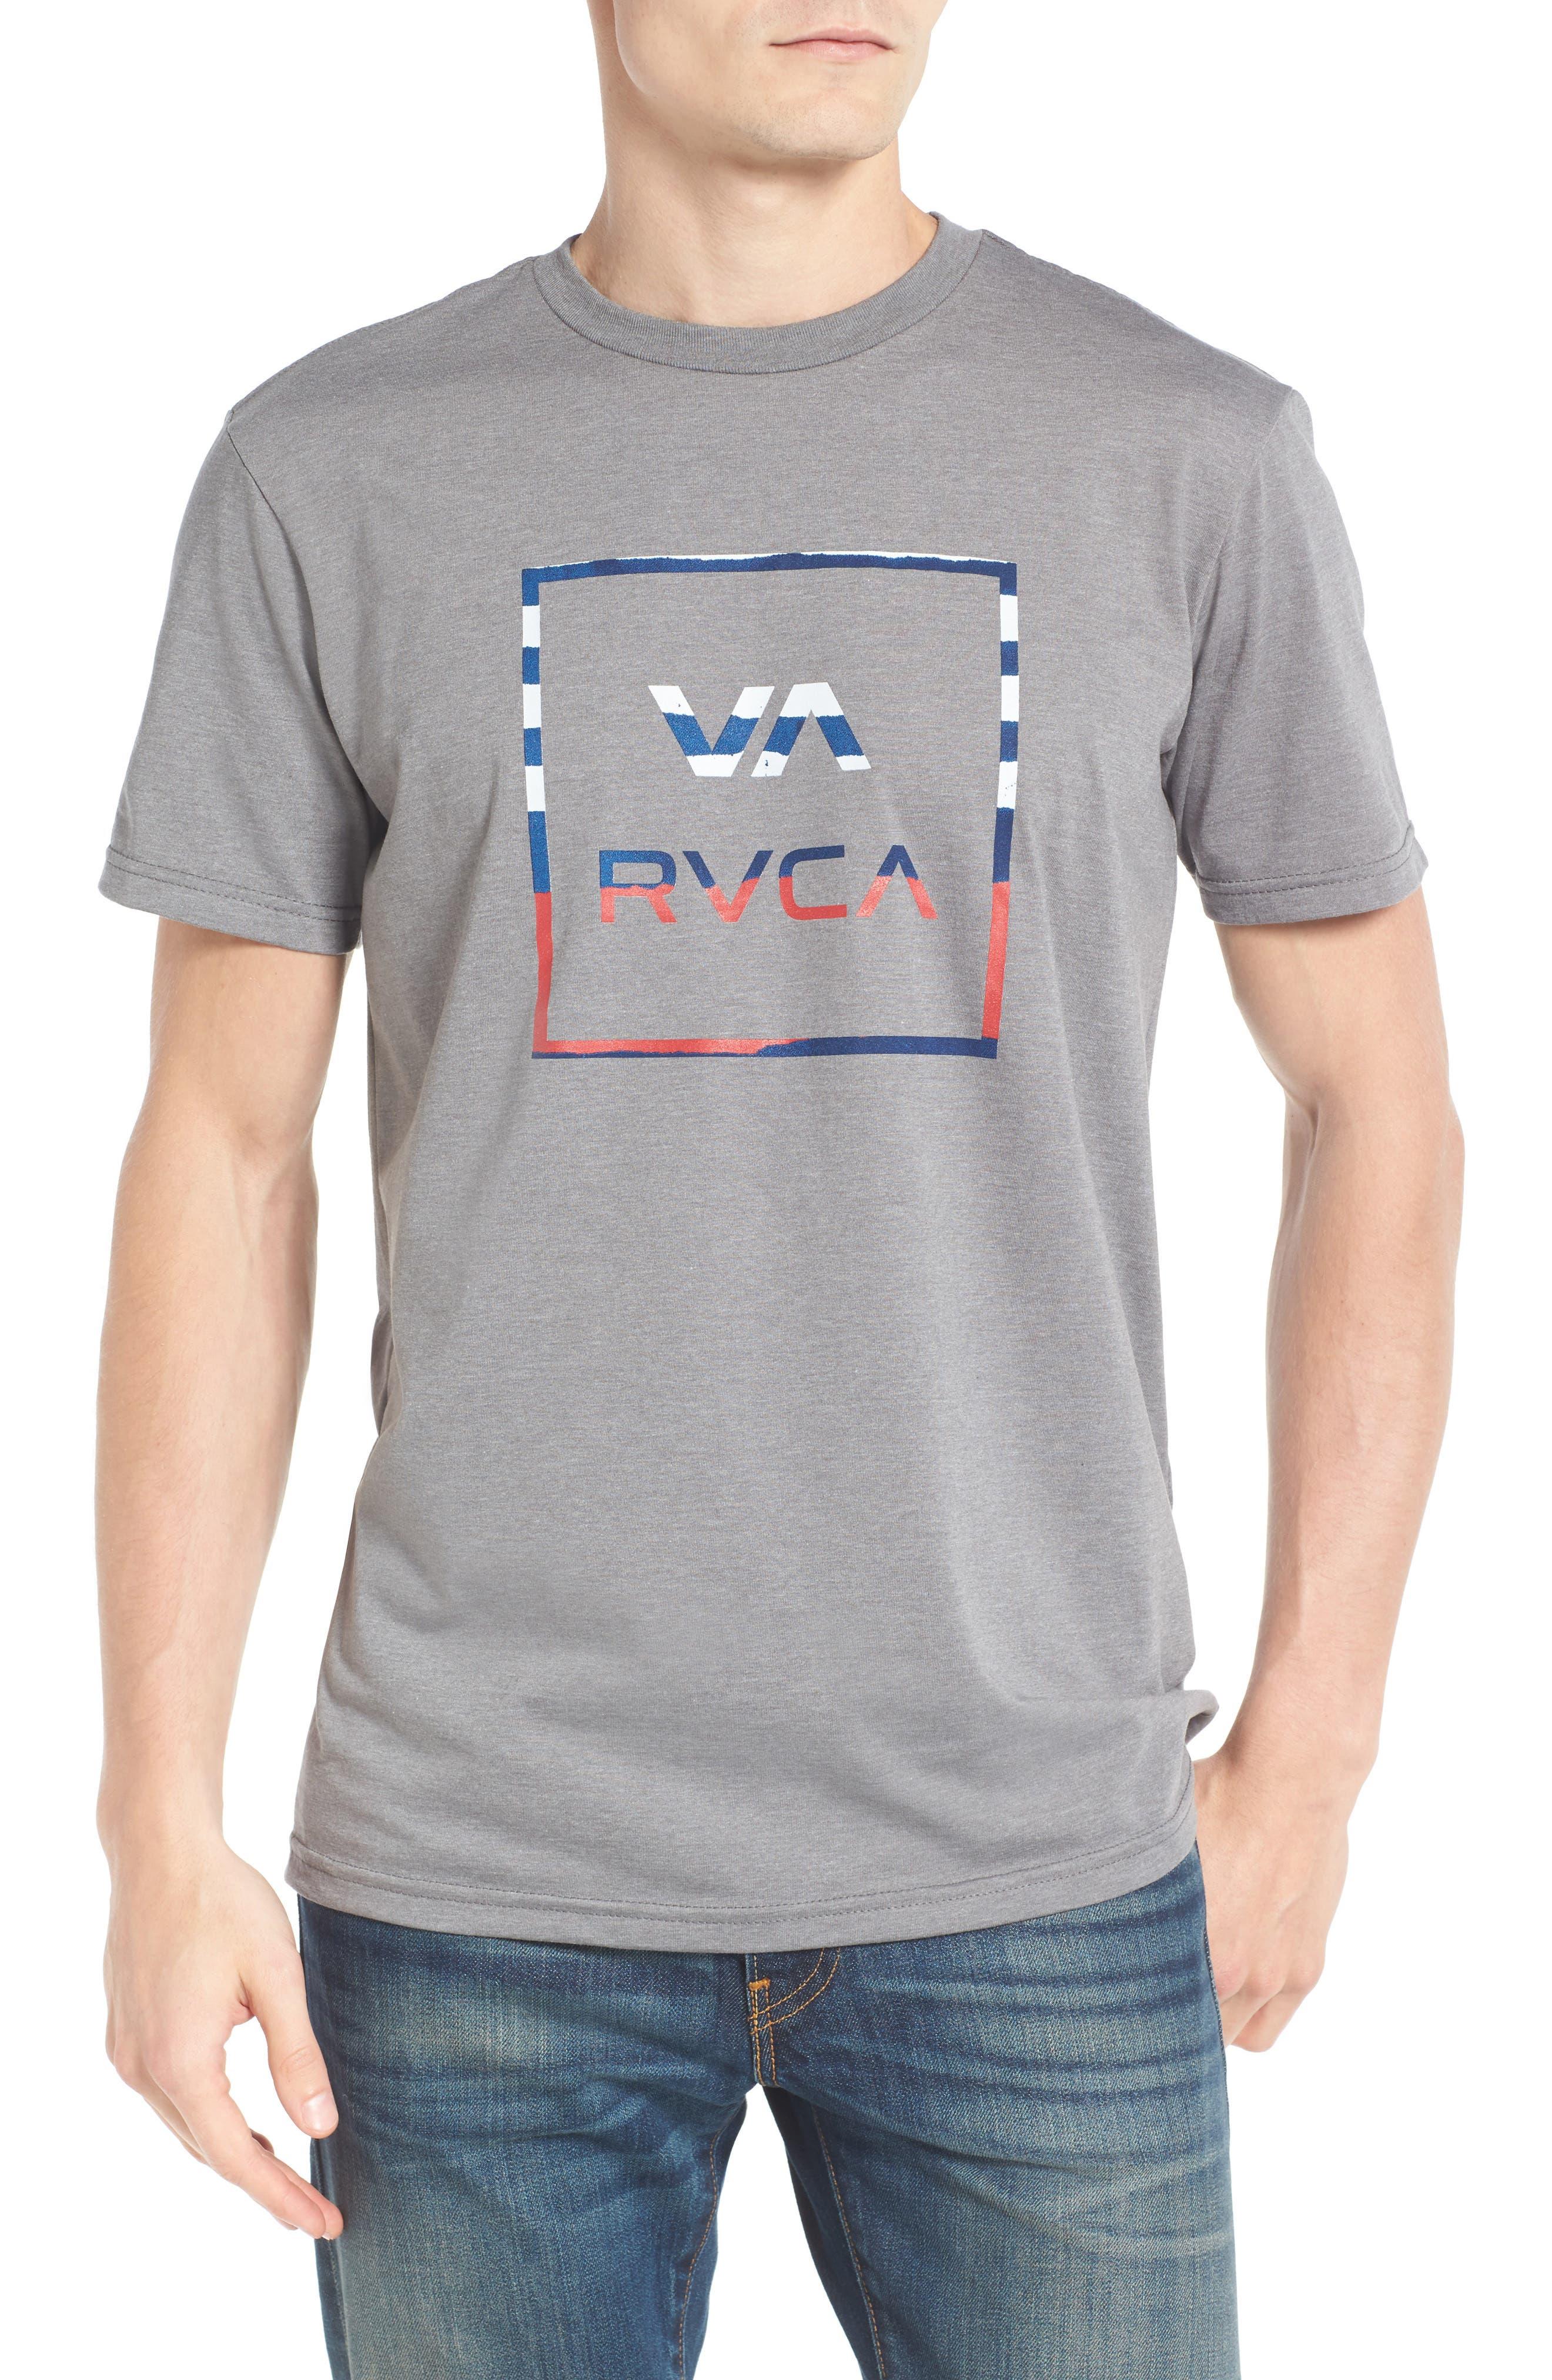 RVCA VA All The Way Graphic T-Shirt